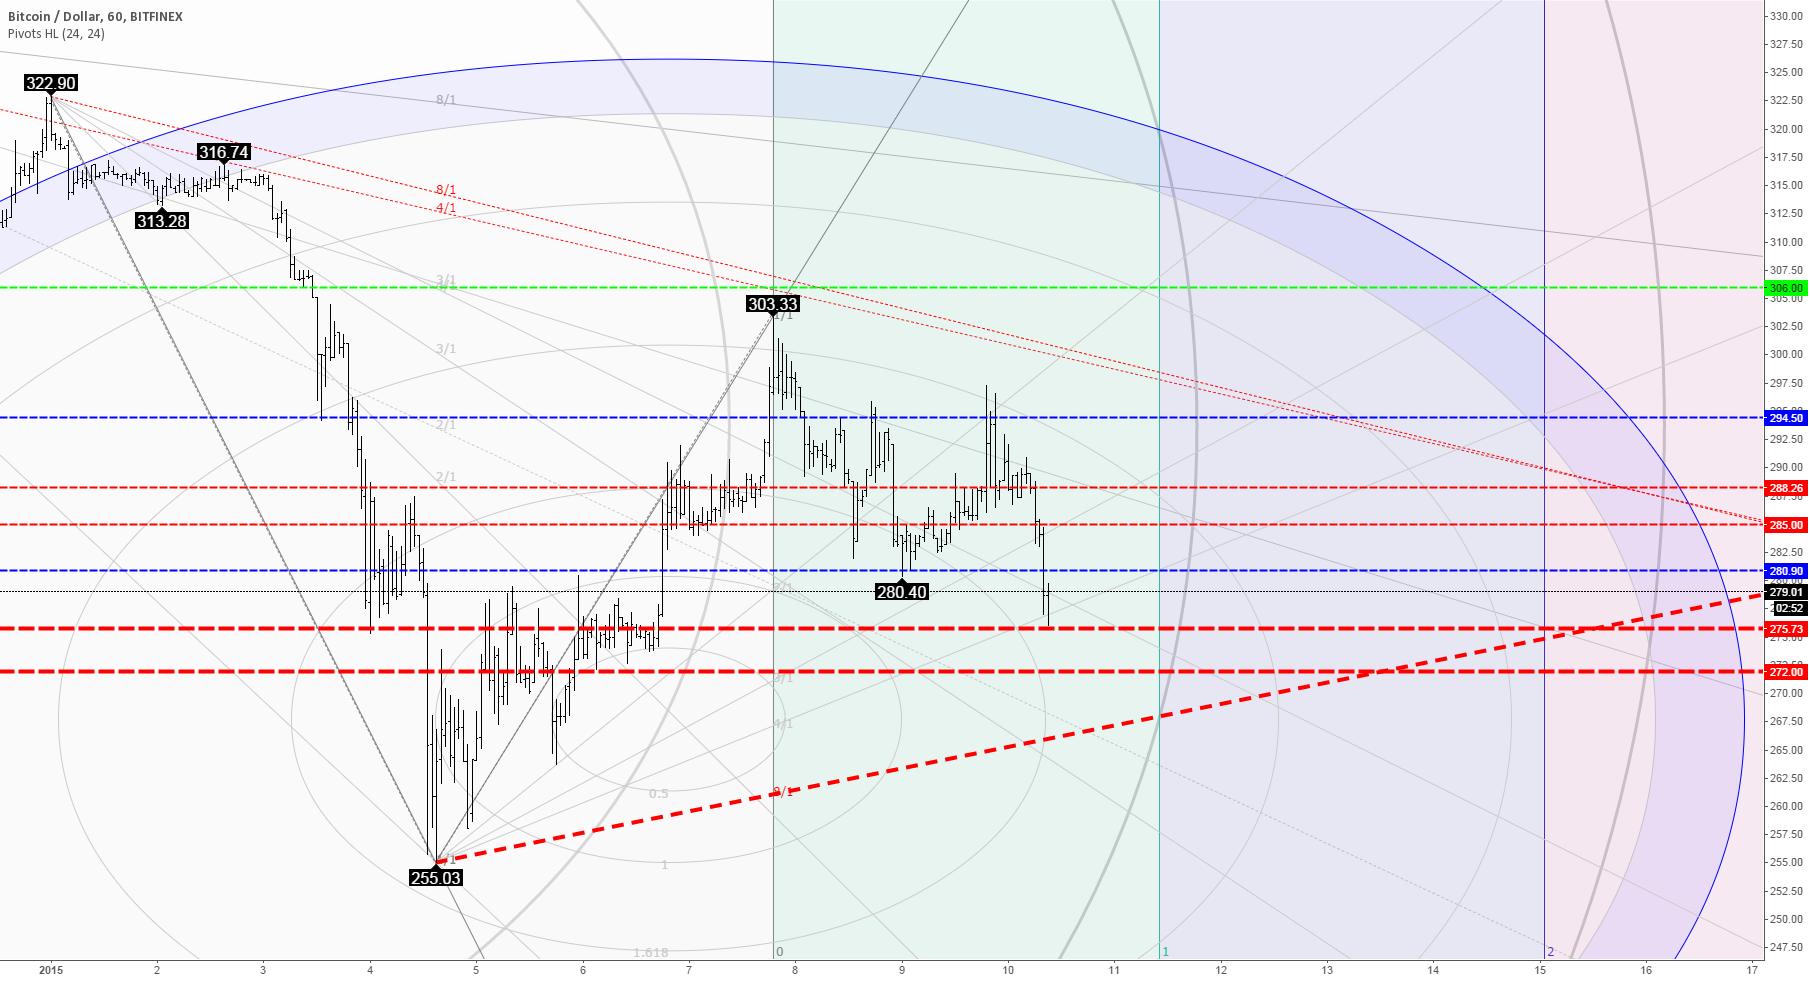 Bitcoin price down. Where next?